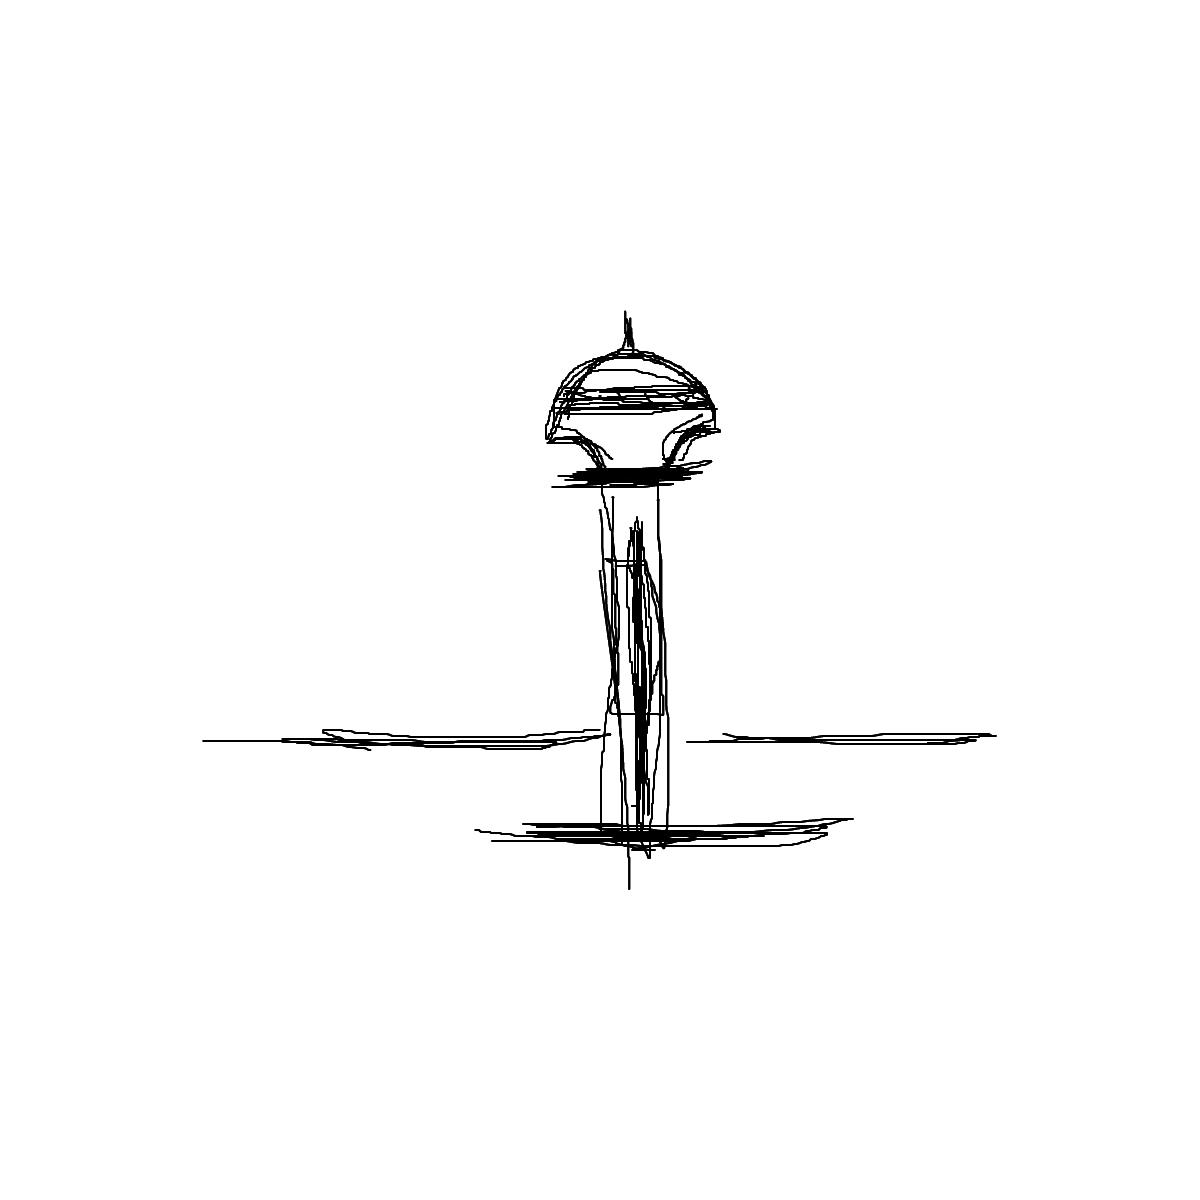 BAAAM drawing#8029 lat:39.8852310180664060lng: 32.8546524047851560